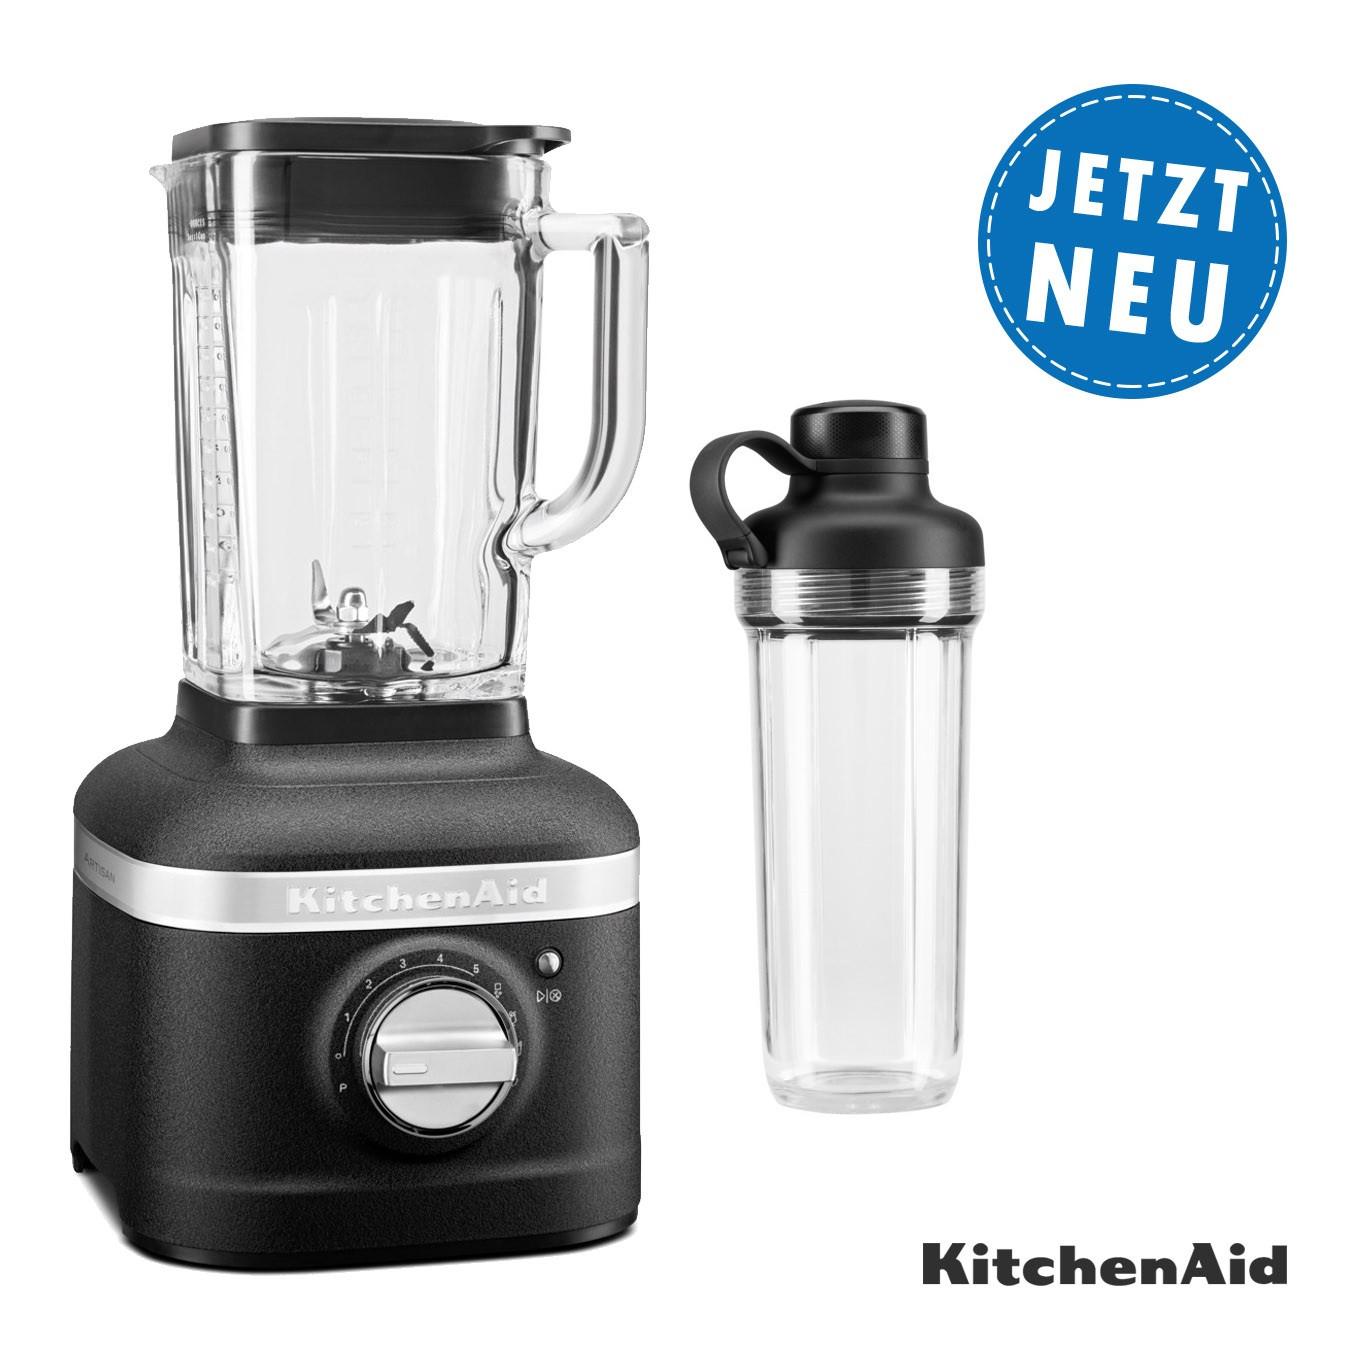 KitchenAid ARTISAN K400 Standmixer 5KSB4043EBK Gusseisen Schwarz Set3